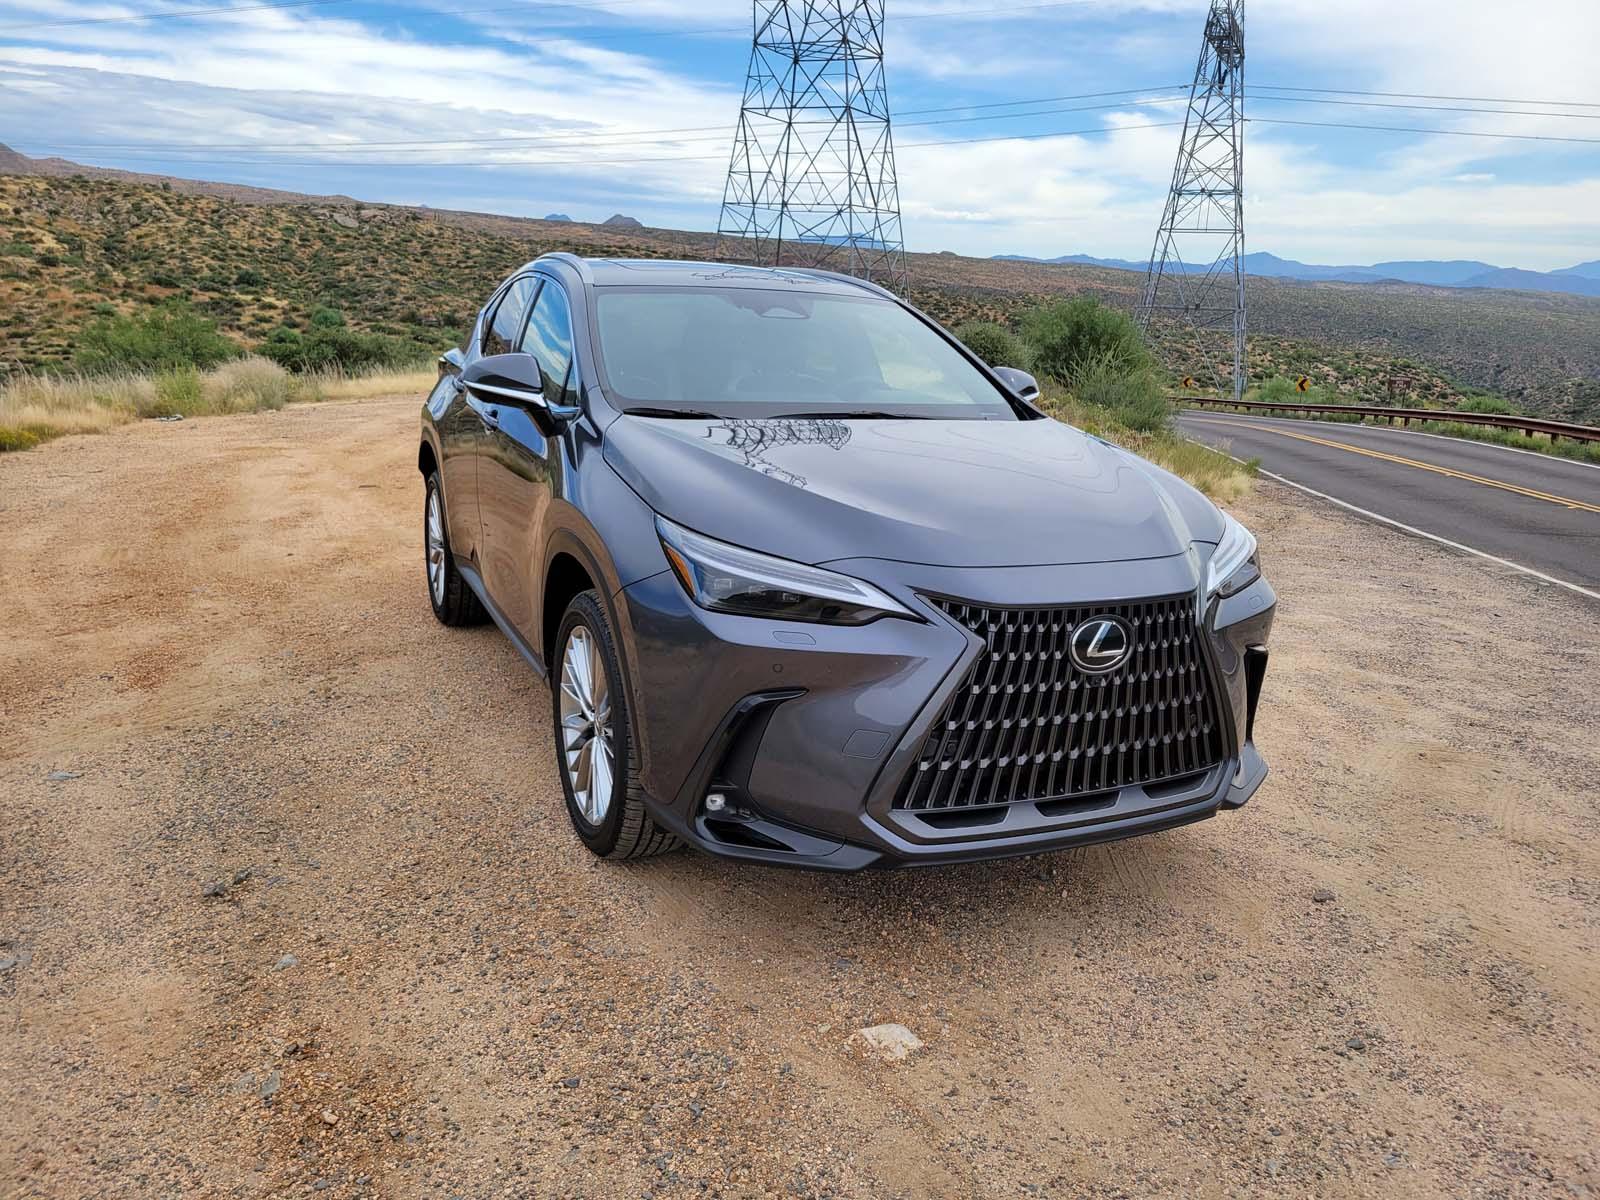 2022 Lexus NX review